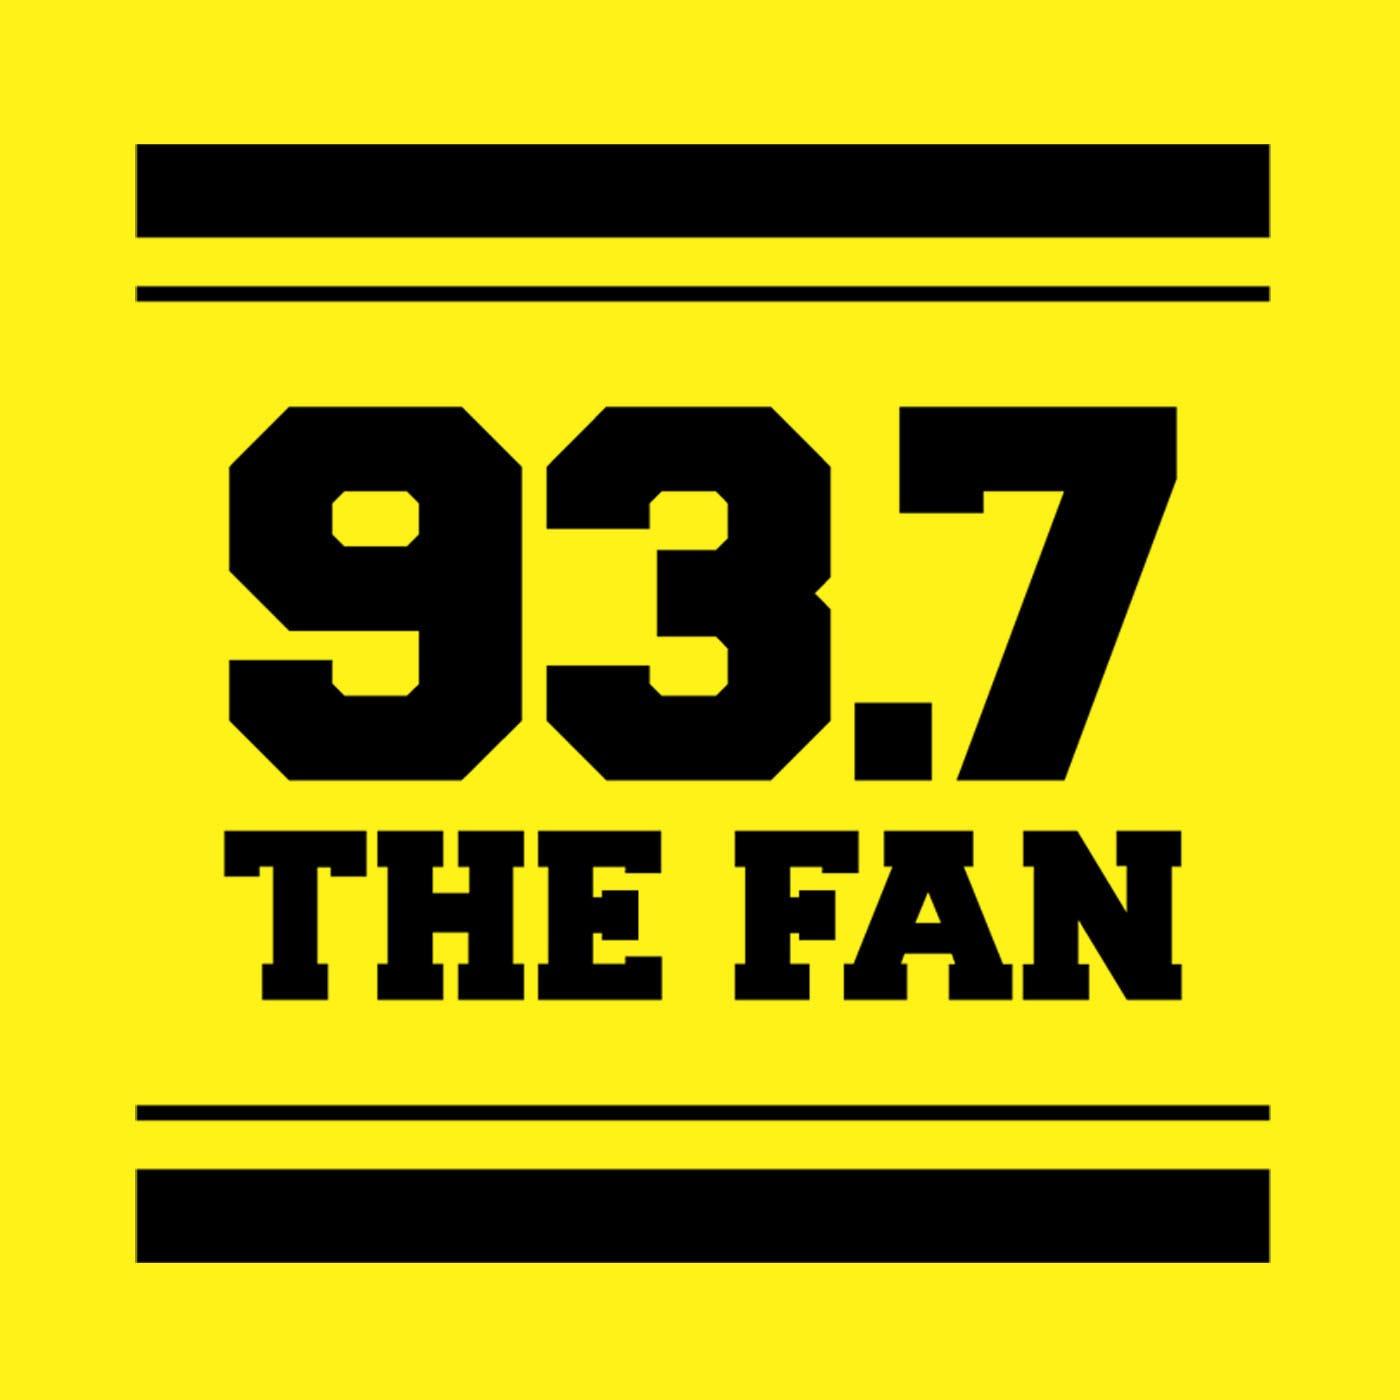 93 7 The Fan on Radio com: Listen to Free Radio Online